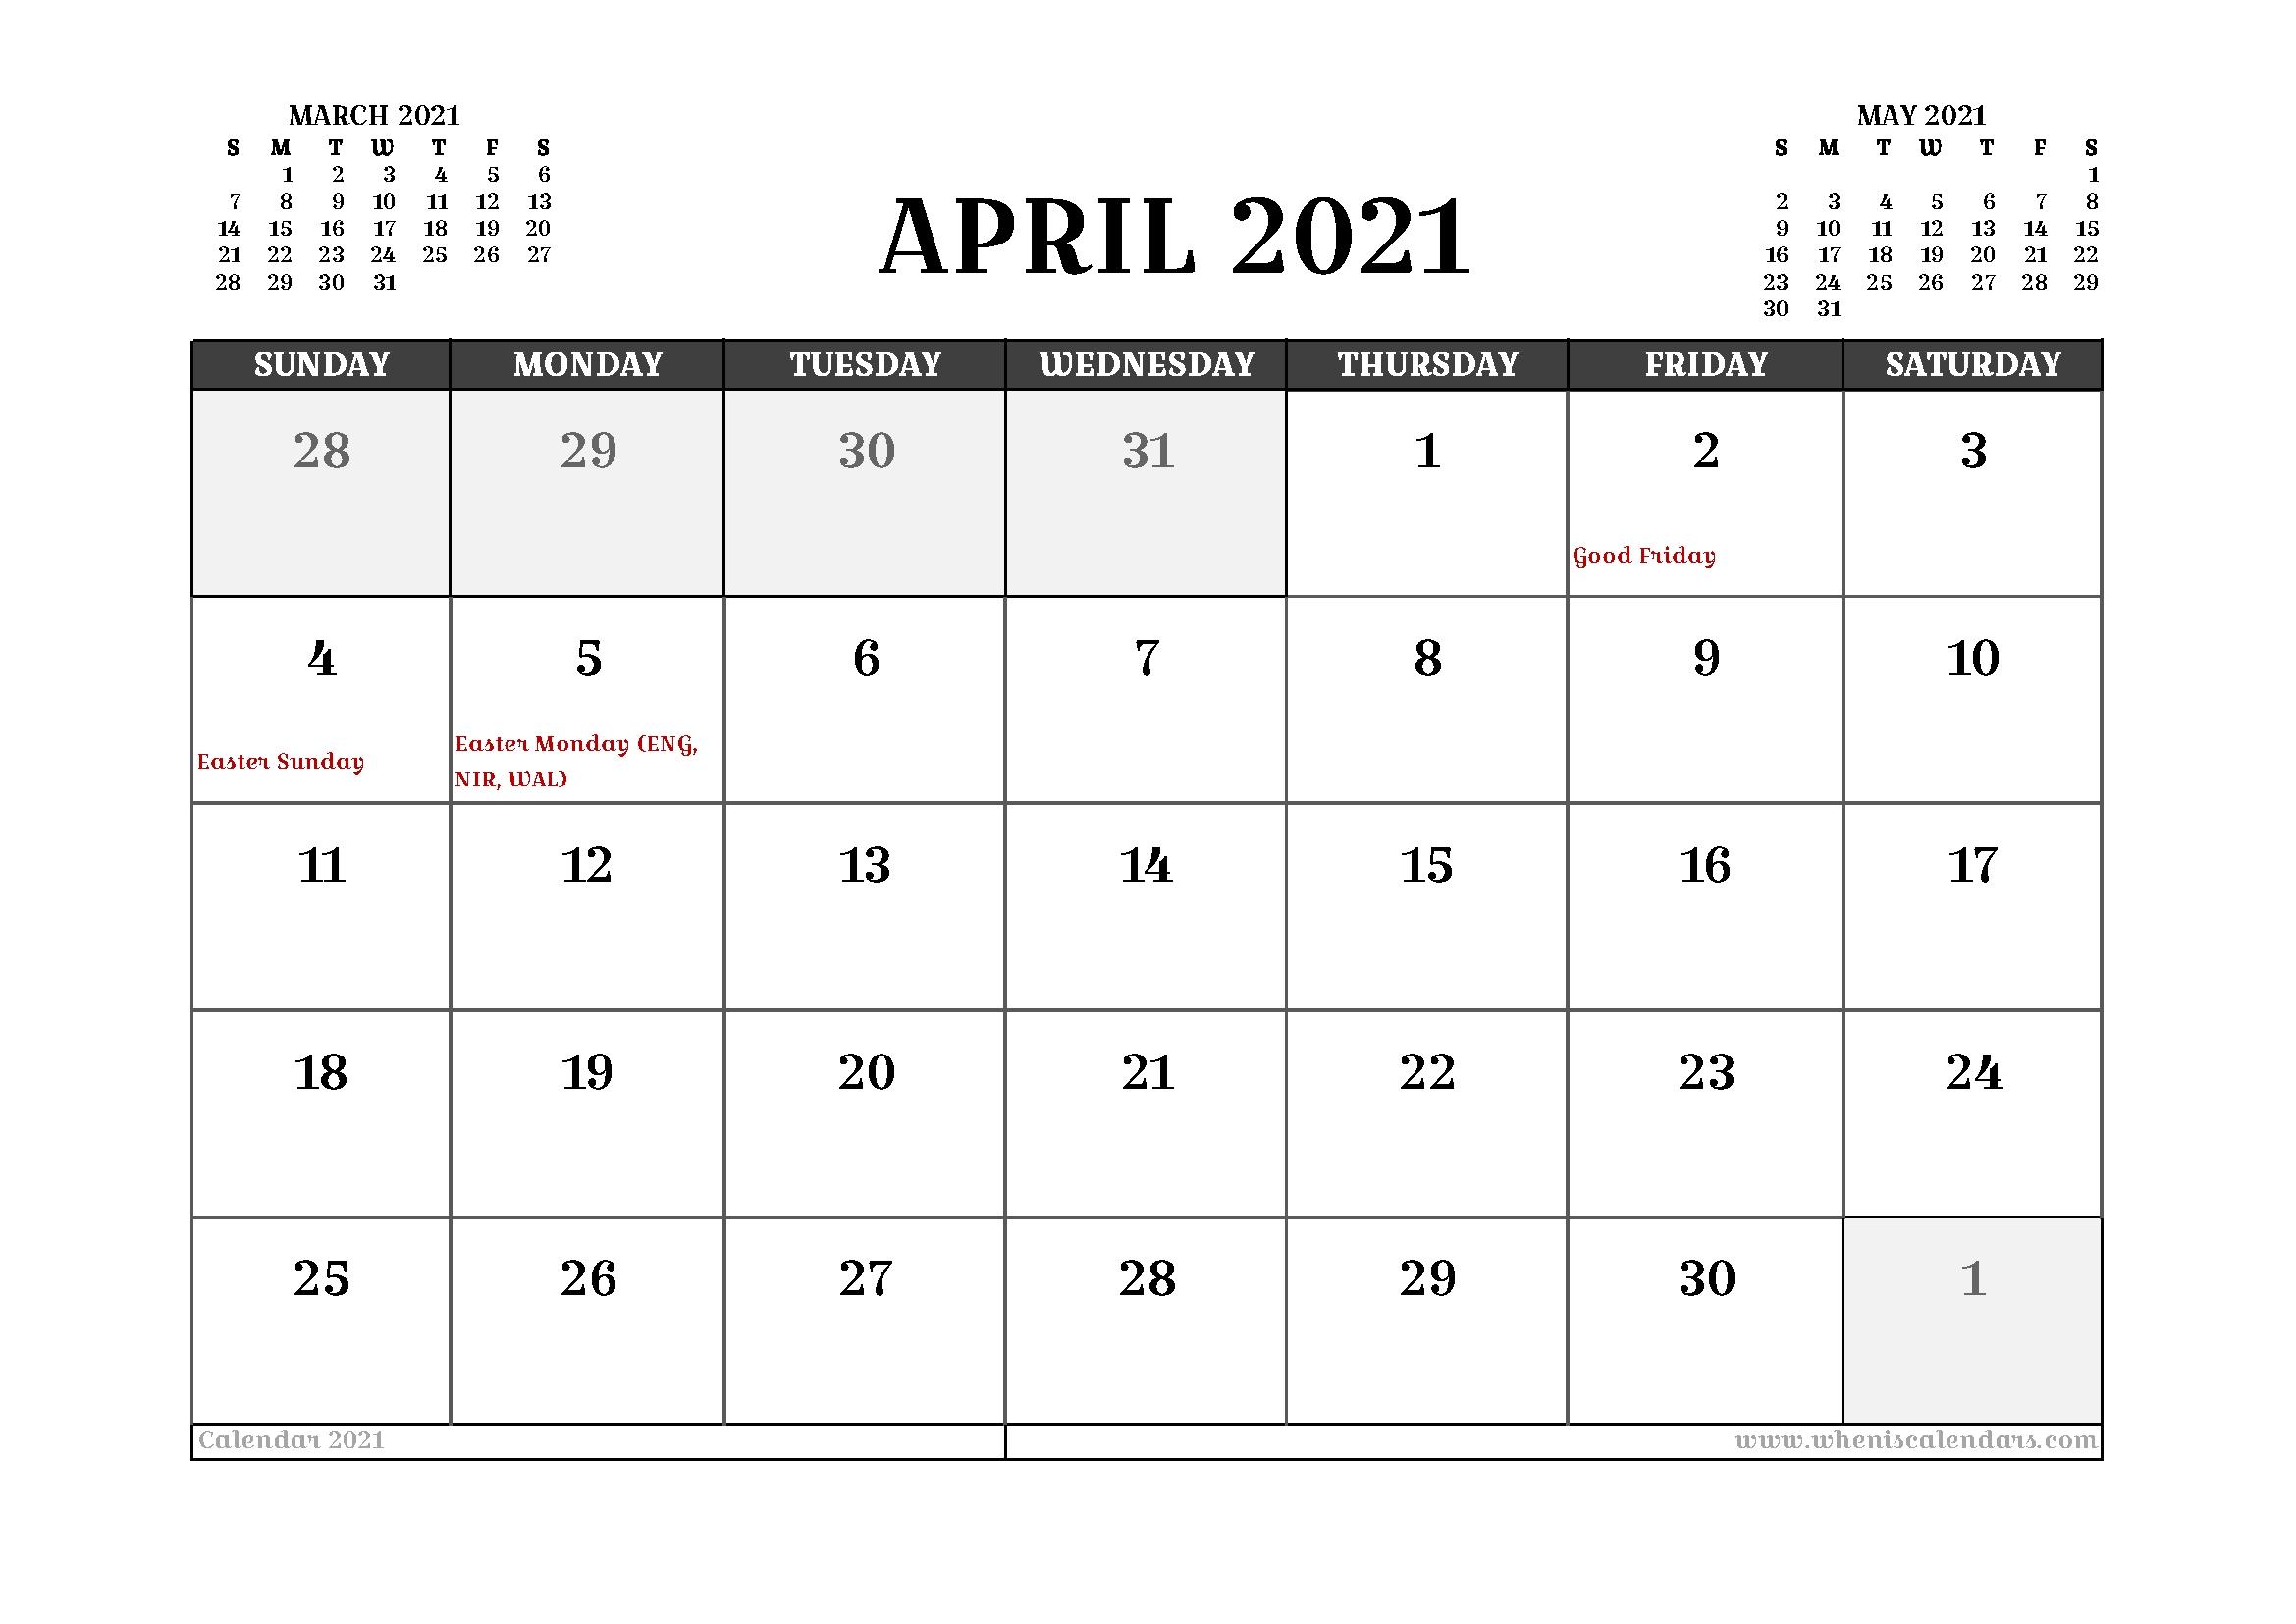 20+ Calendar 2021 Easter - Free Download Printable Calendar Templates ️ September 2021 Calendar Printable Wiki